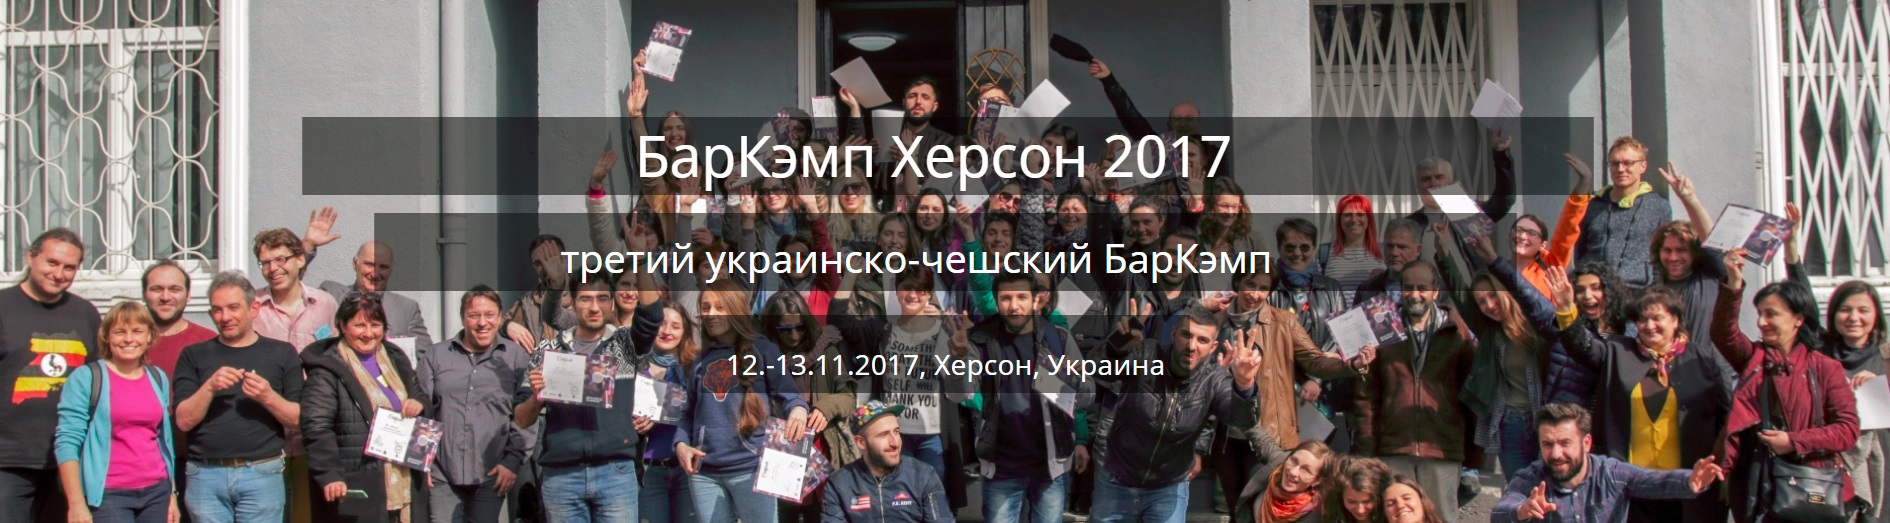 BarCamp-3_171013